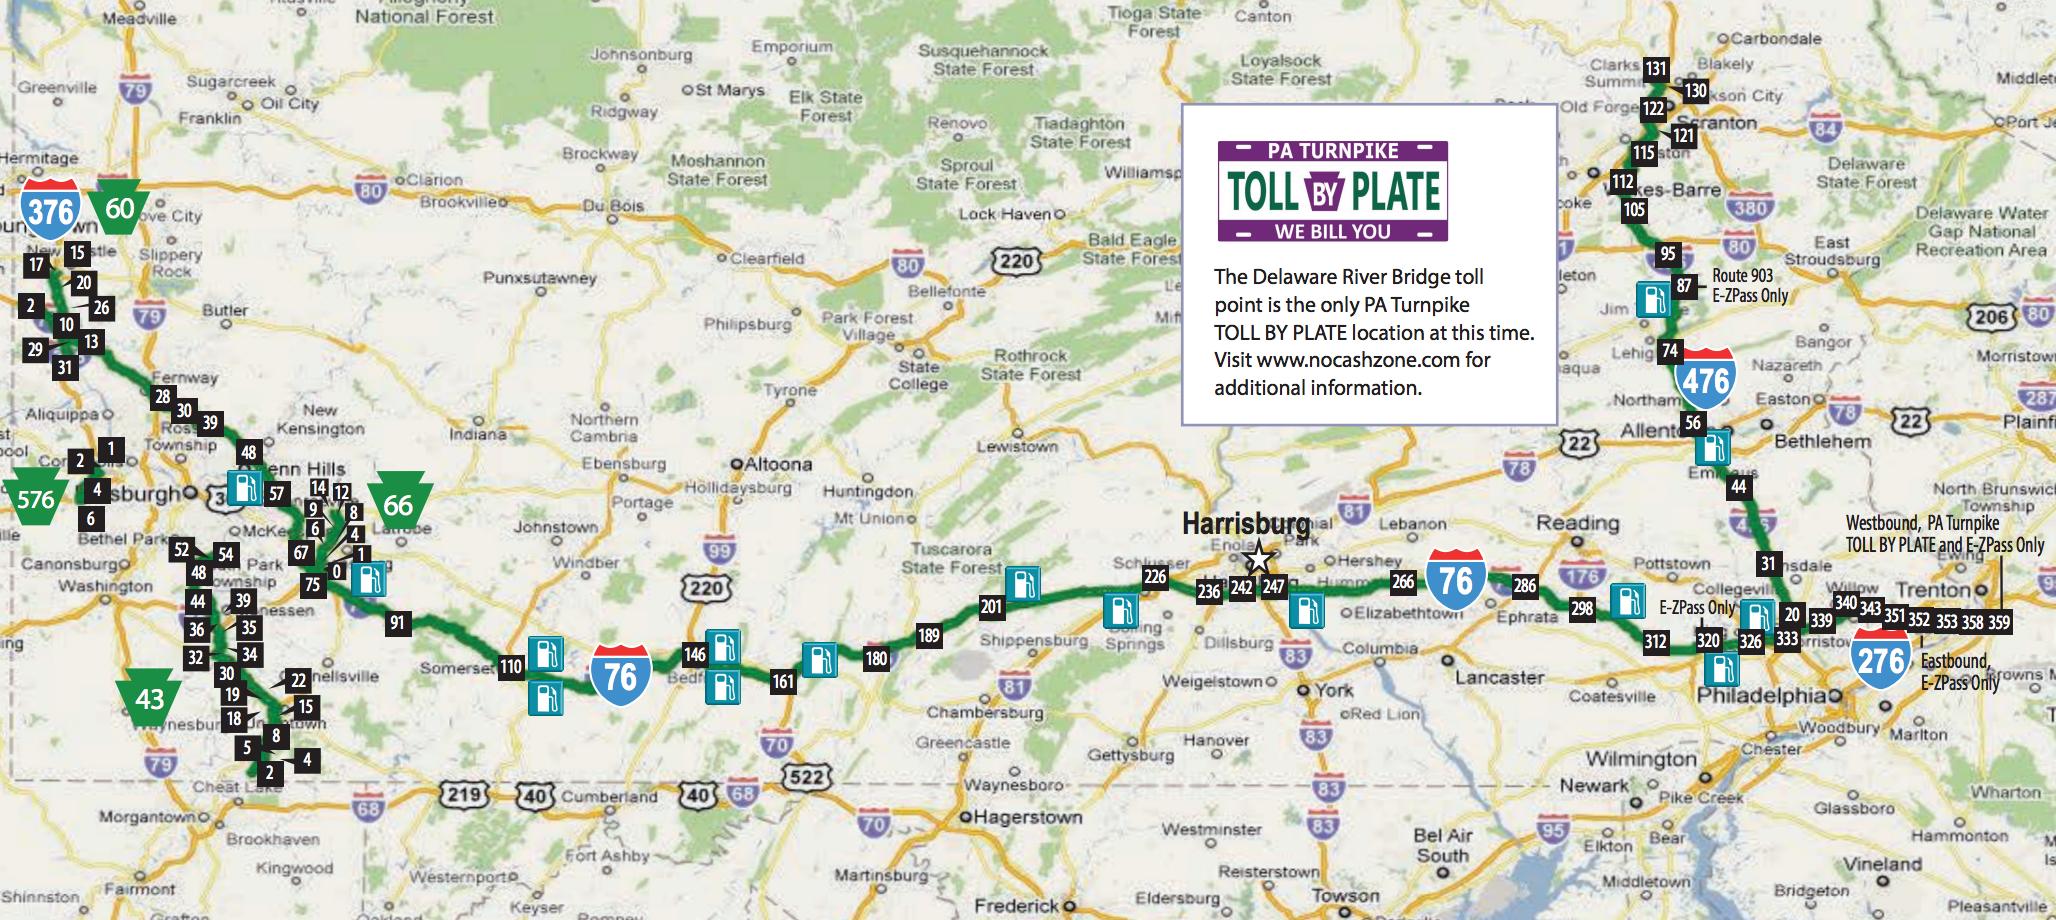 Pennsylvania Turnpike tolls increasing again in 2017